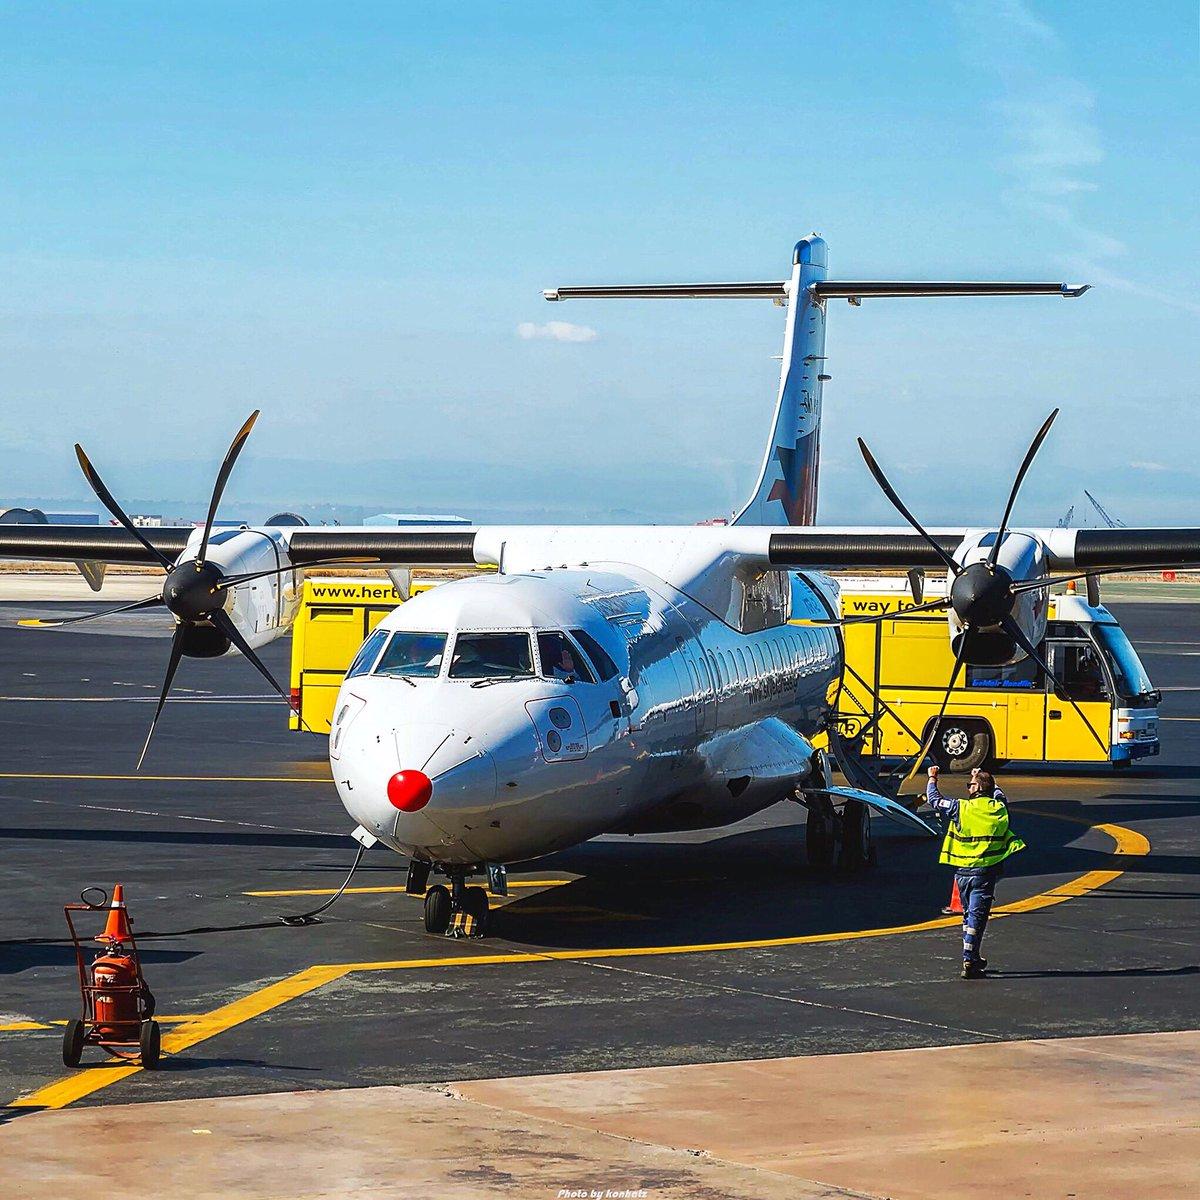 ATR42 of Sky Express in SKG!🛫 - @ATRaircraft  #skyexpressgreece #skyexpress #GQ #ATR #ATR42 #ATRintolife #Thessaloniki #aircraft #skg #lgts #airplane #airport #aviation #Makedonia #avgeek #weareislanders #ramp #wanderlust https://t.co/oeOcTzI2nw